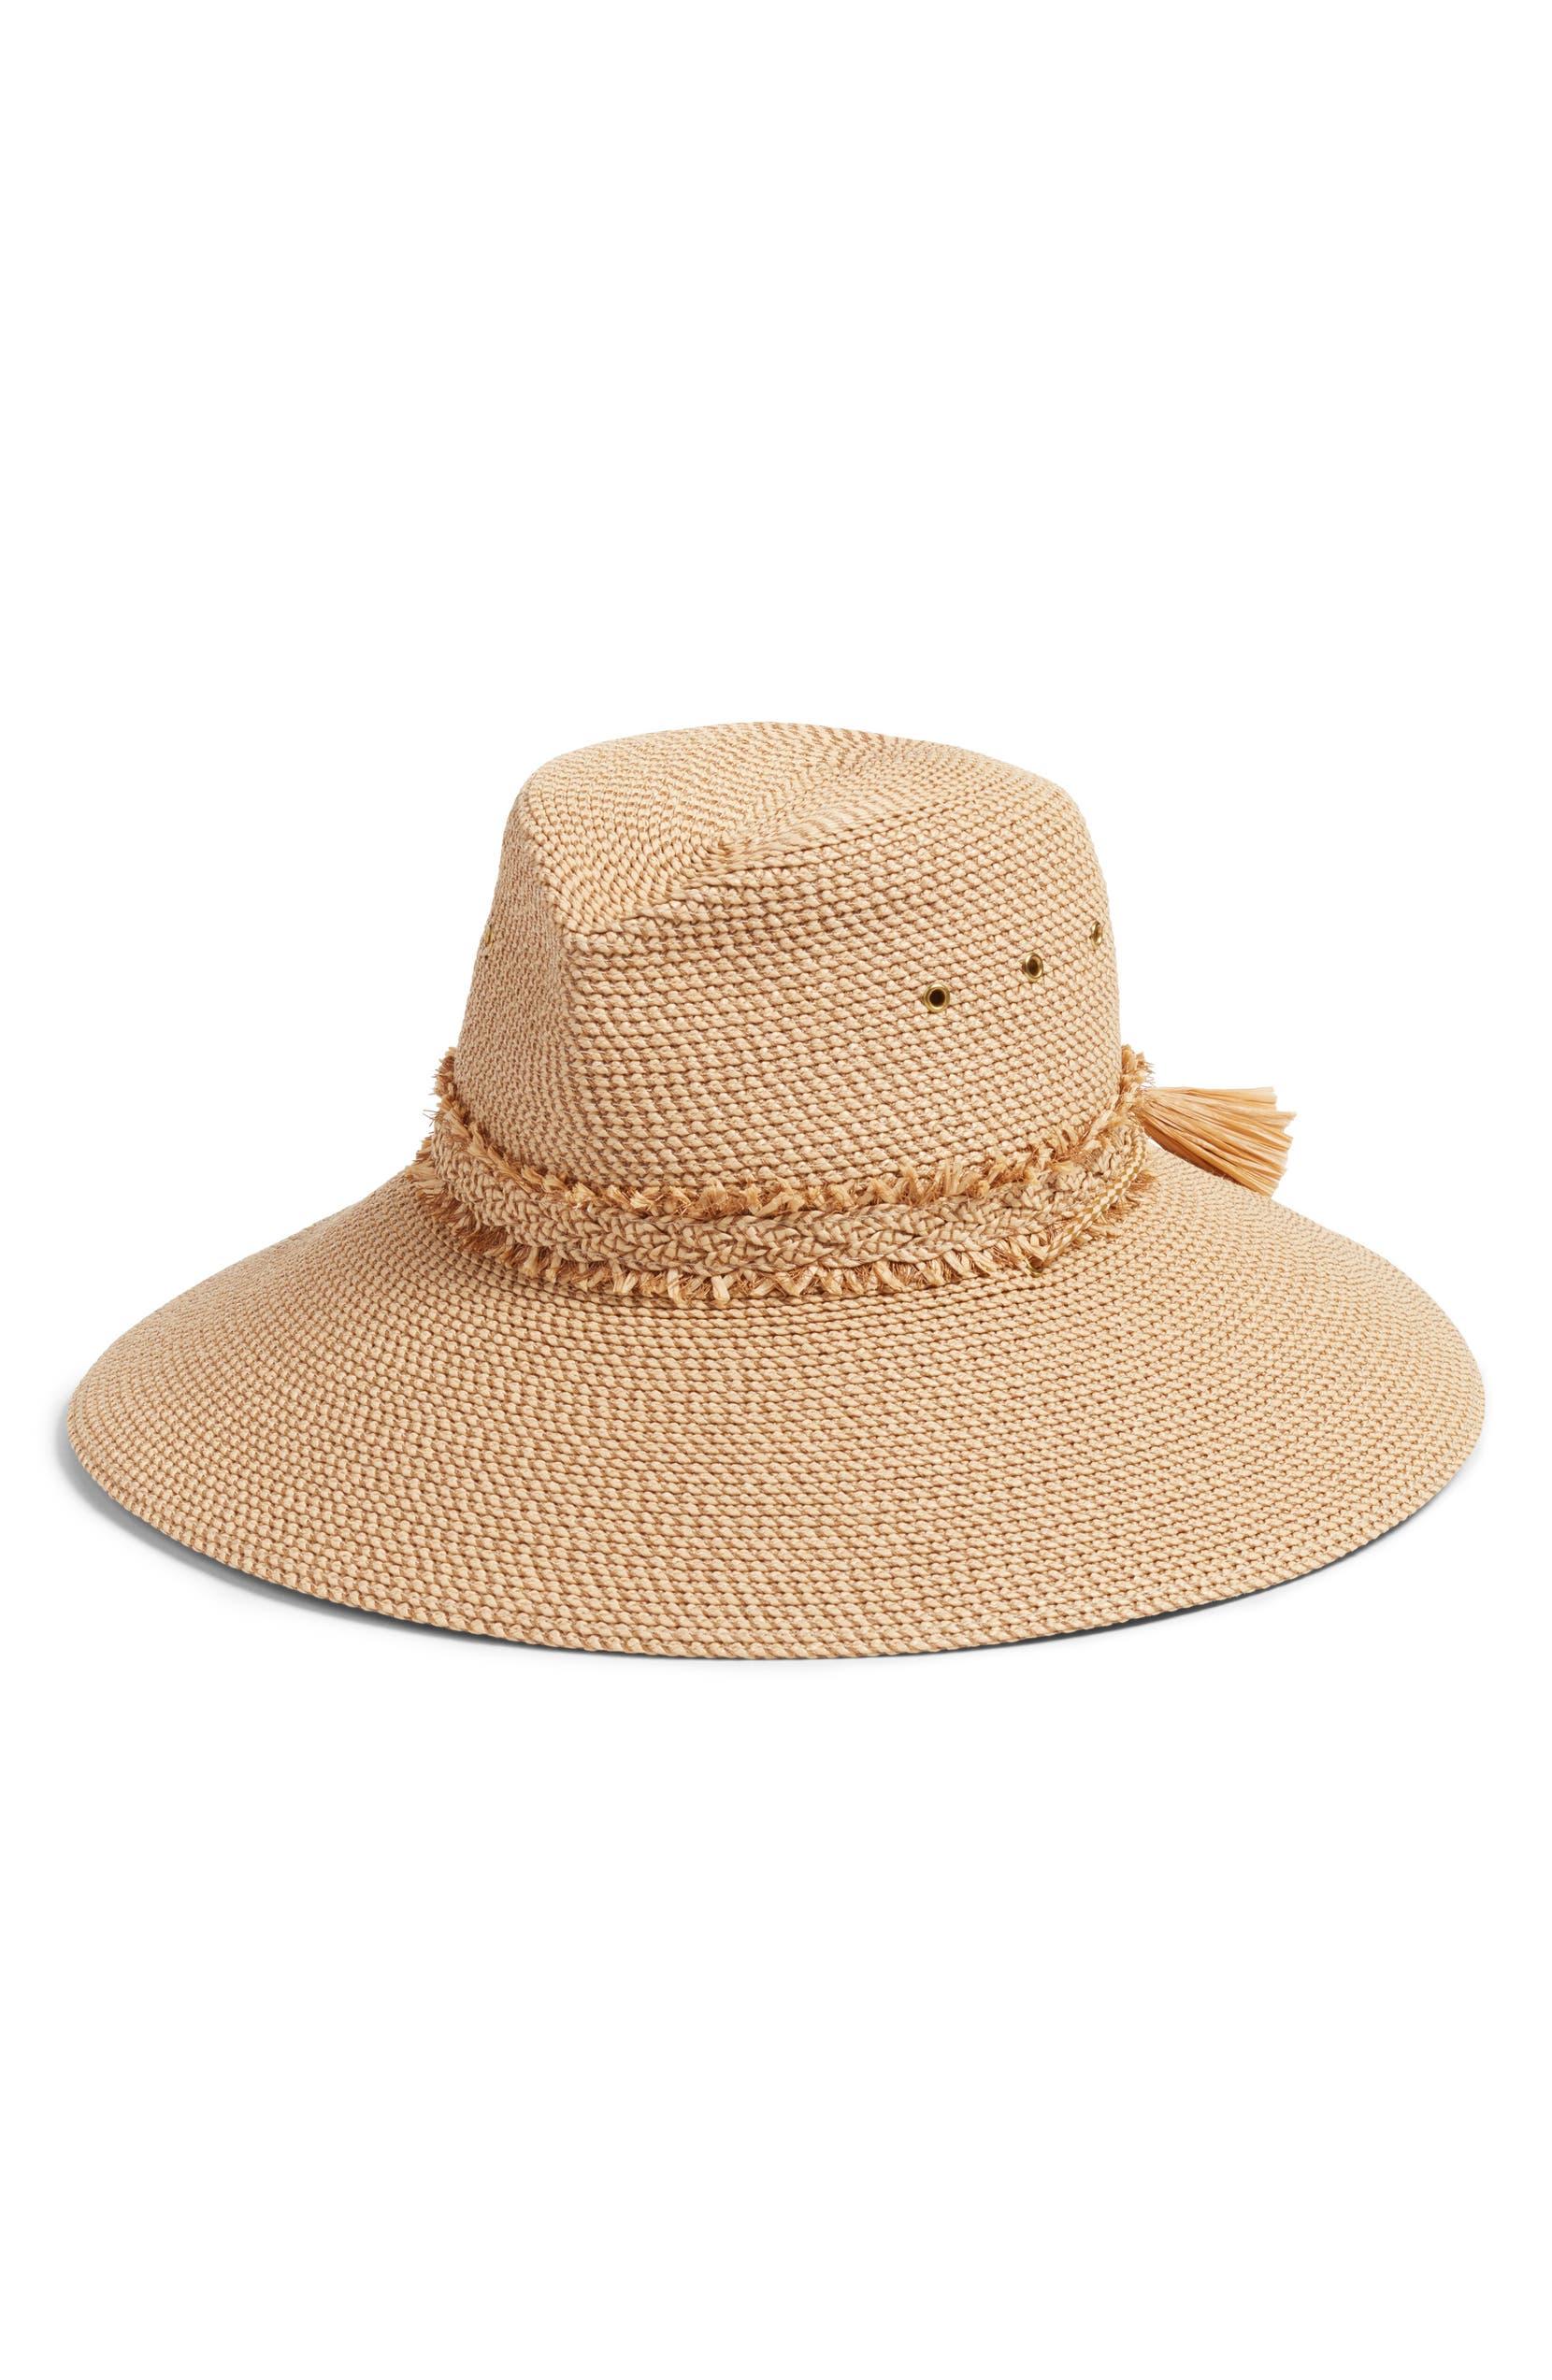 Eric Javits Voyager Squishee® Sun Hat  e84d9634d18